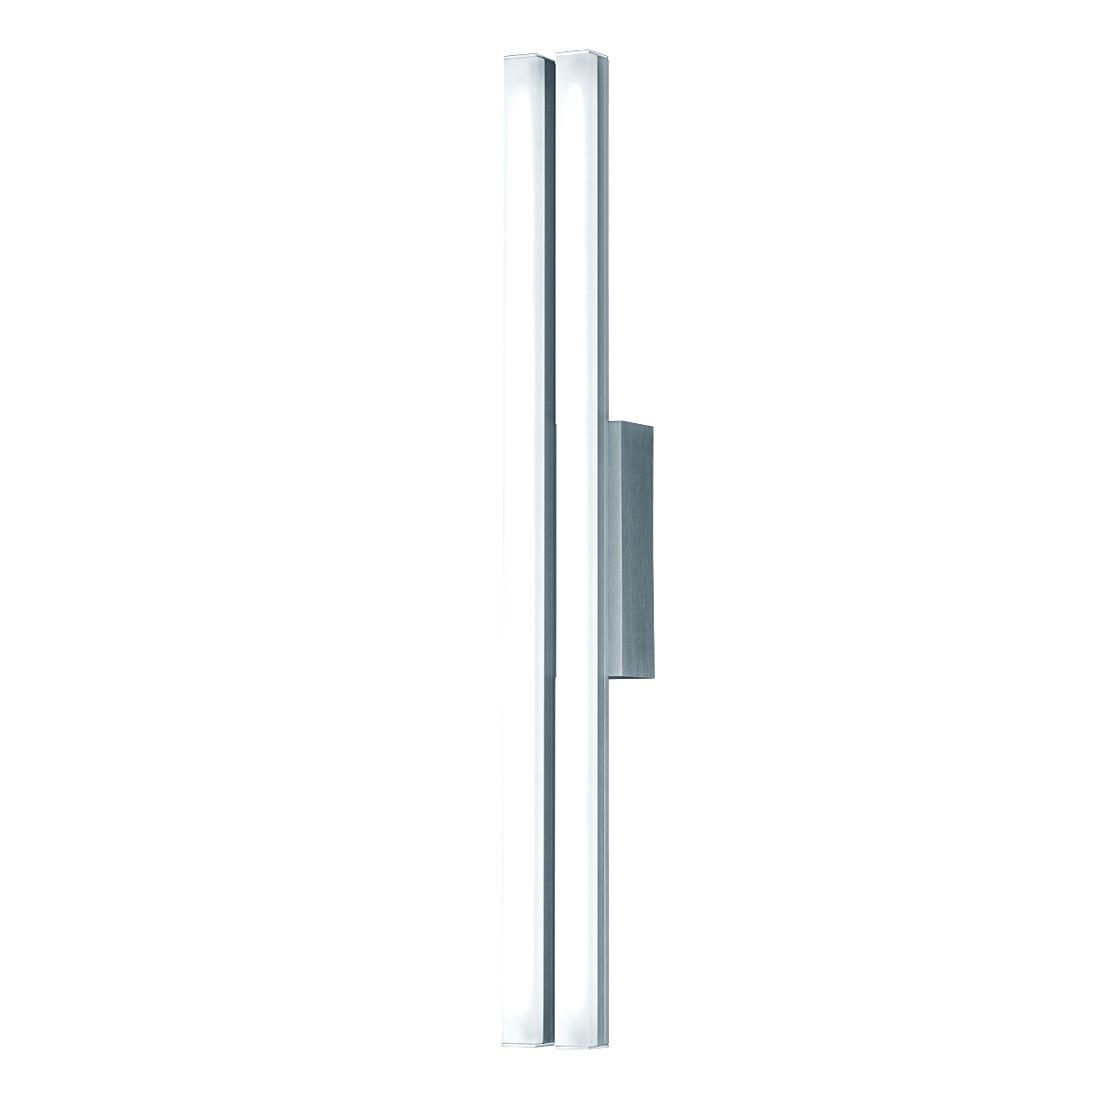 EEK A+, Wandleuchte KARA – Metall – 1-flammig, Helestra kaufen